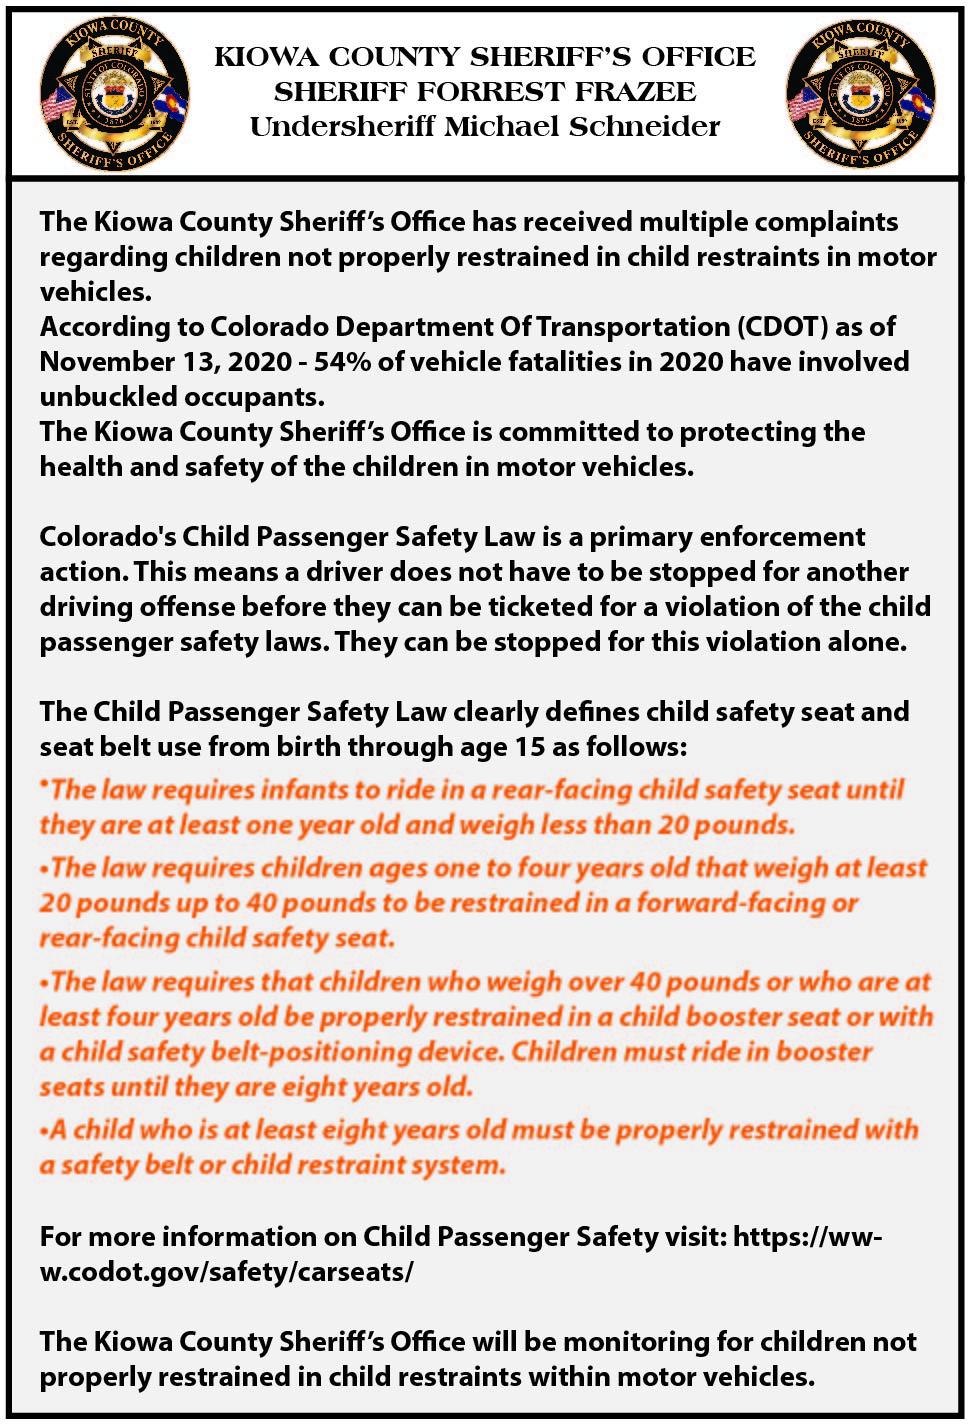 AD 2021-06 Community - Child Safety Seats